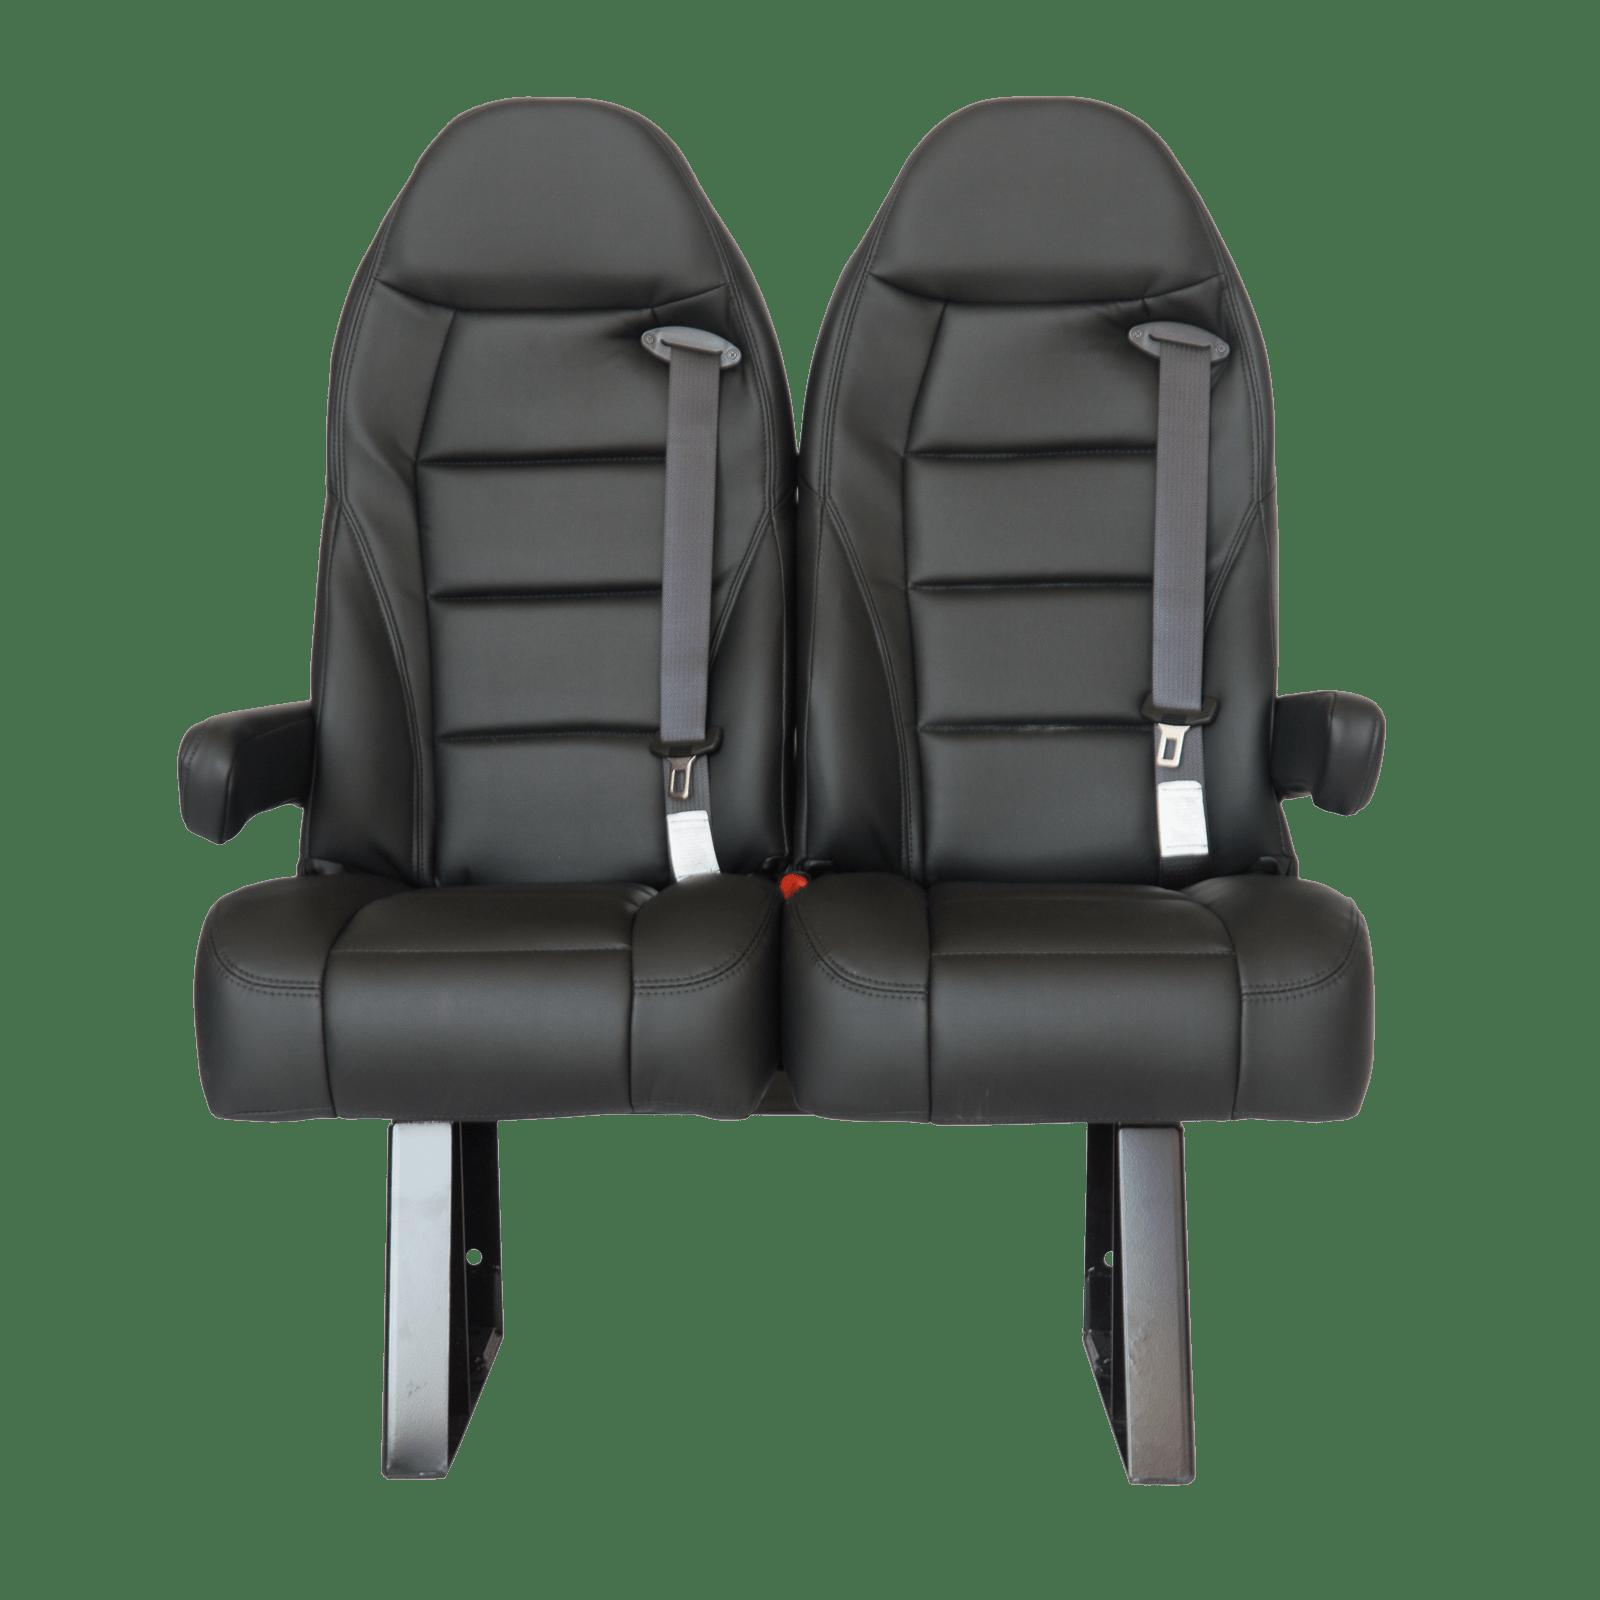 2 Person Bench Seat - Conversion Van Seats - Titan DIY Kits